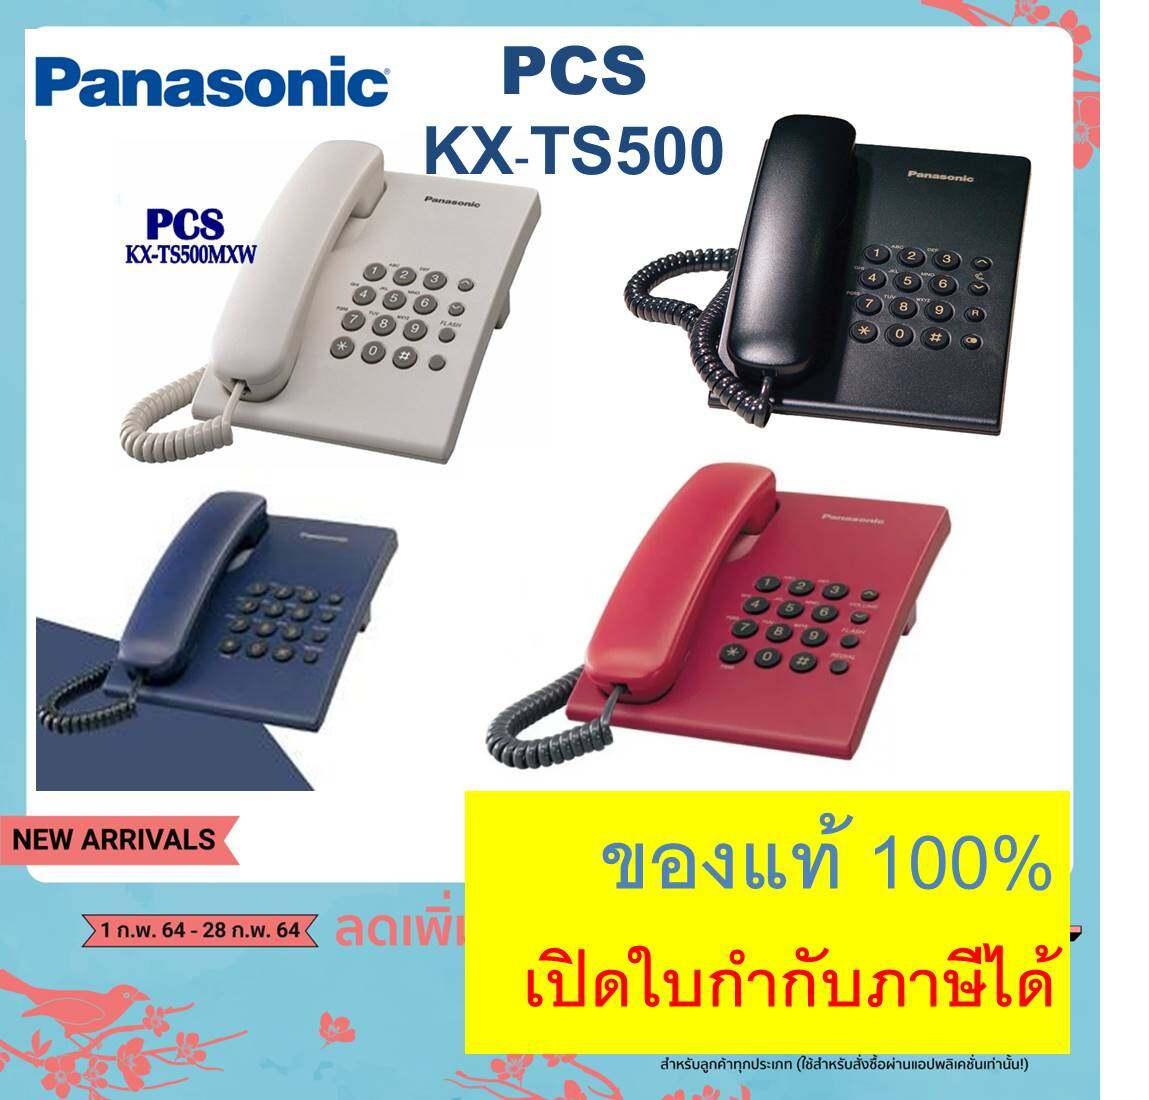 Panasonic Kx-Ts500mx โทรศัพท์รุ่นนิยม (single Line Telephone) ถูกมาก โทรศัพท์บ้าน สำนักงาน.